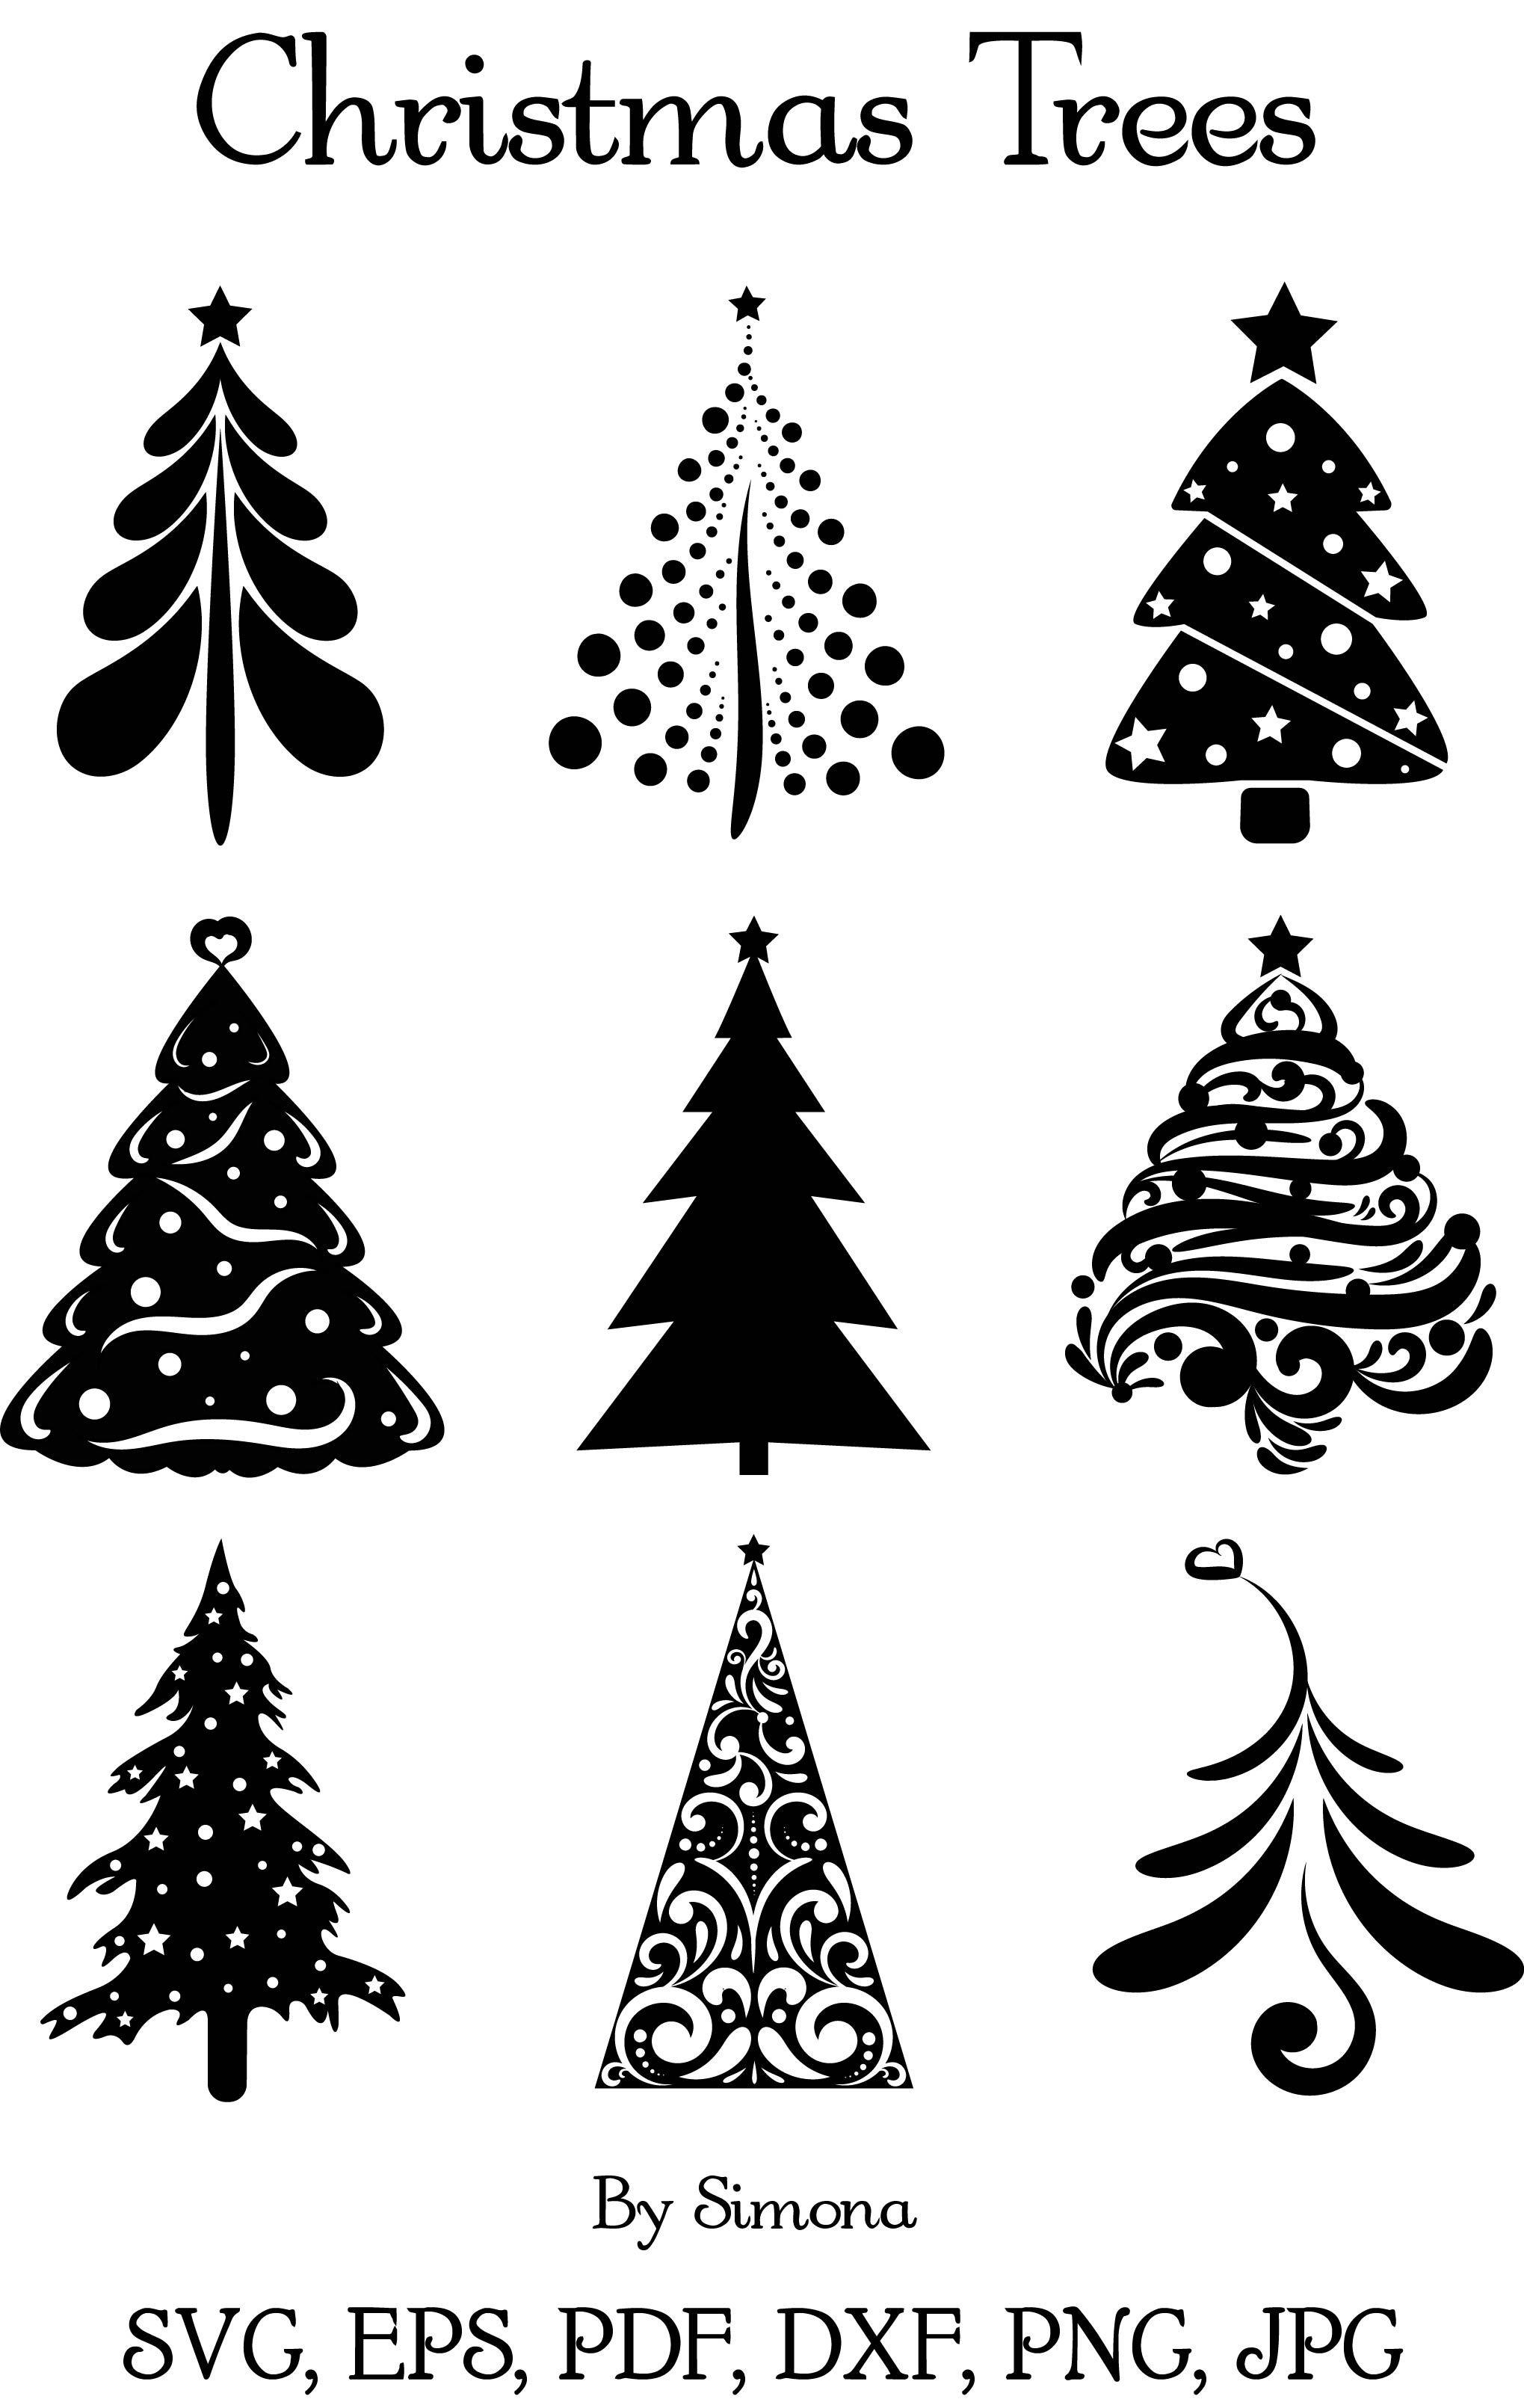 Christmas Trees SVG/PNG.